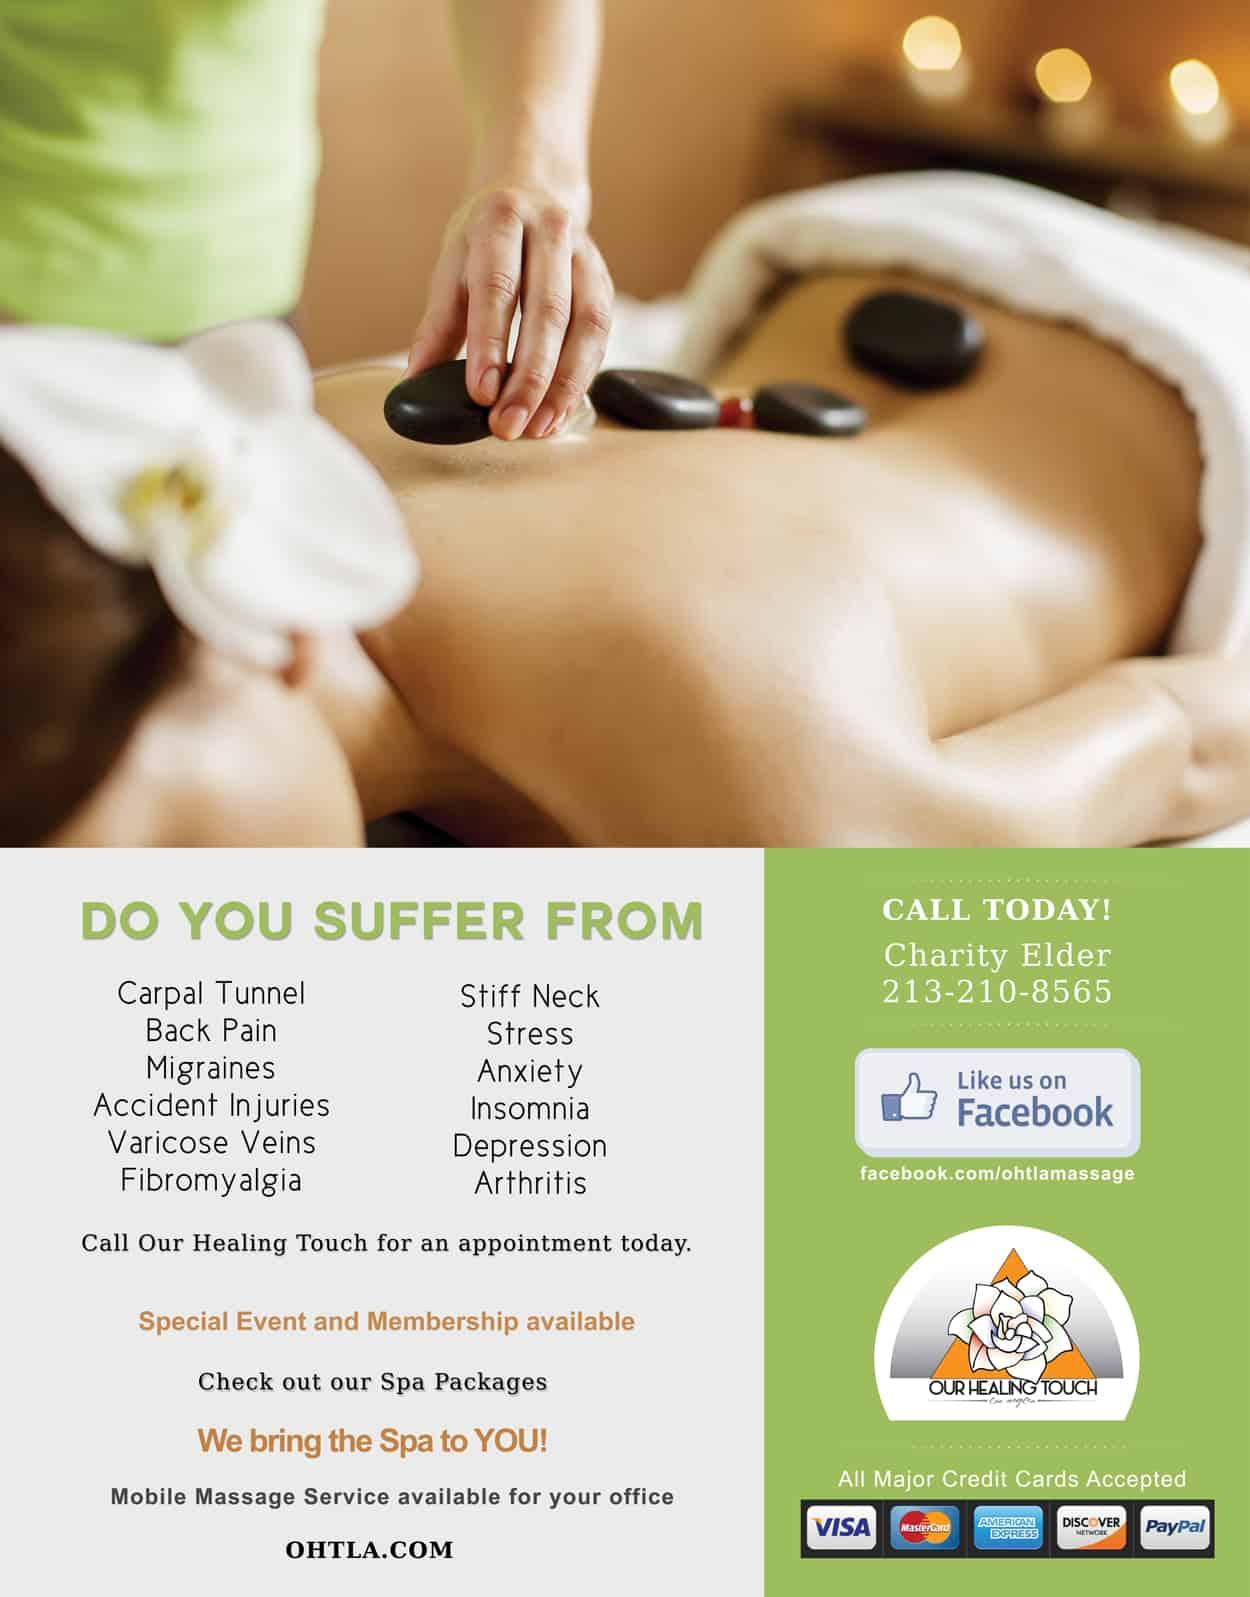 ohtla - full page magazine ad design